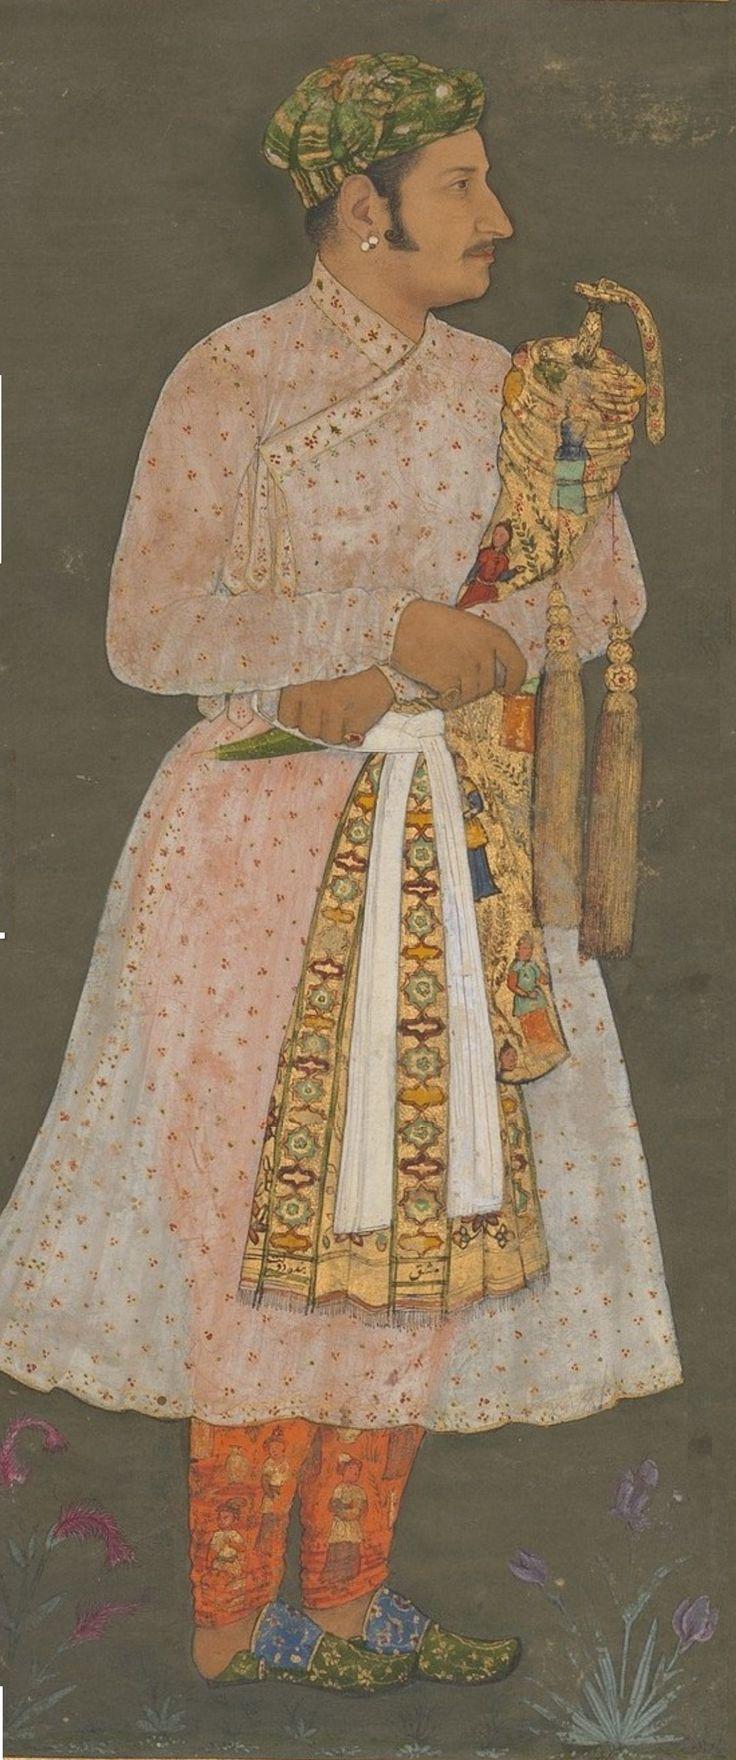 Inayat Khan